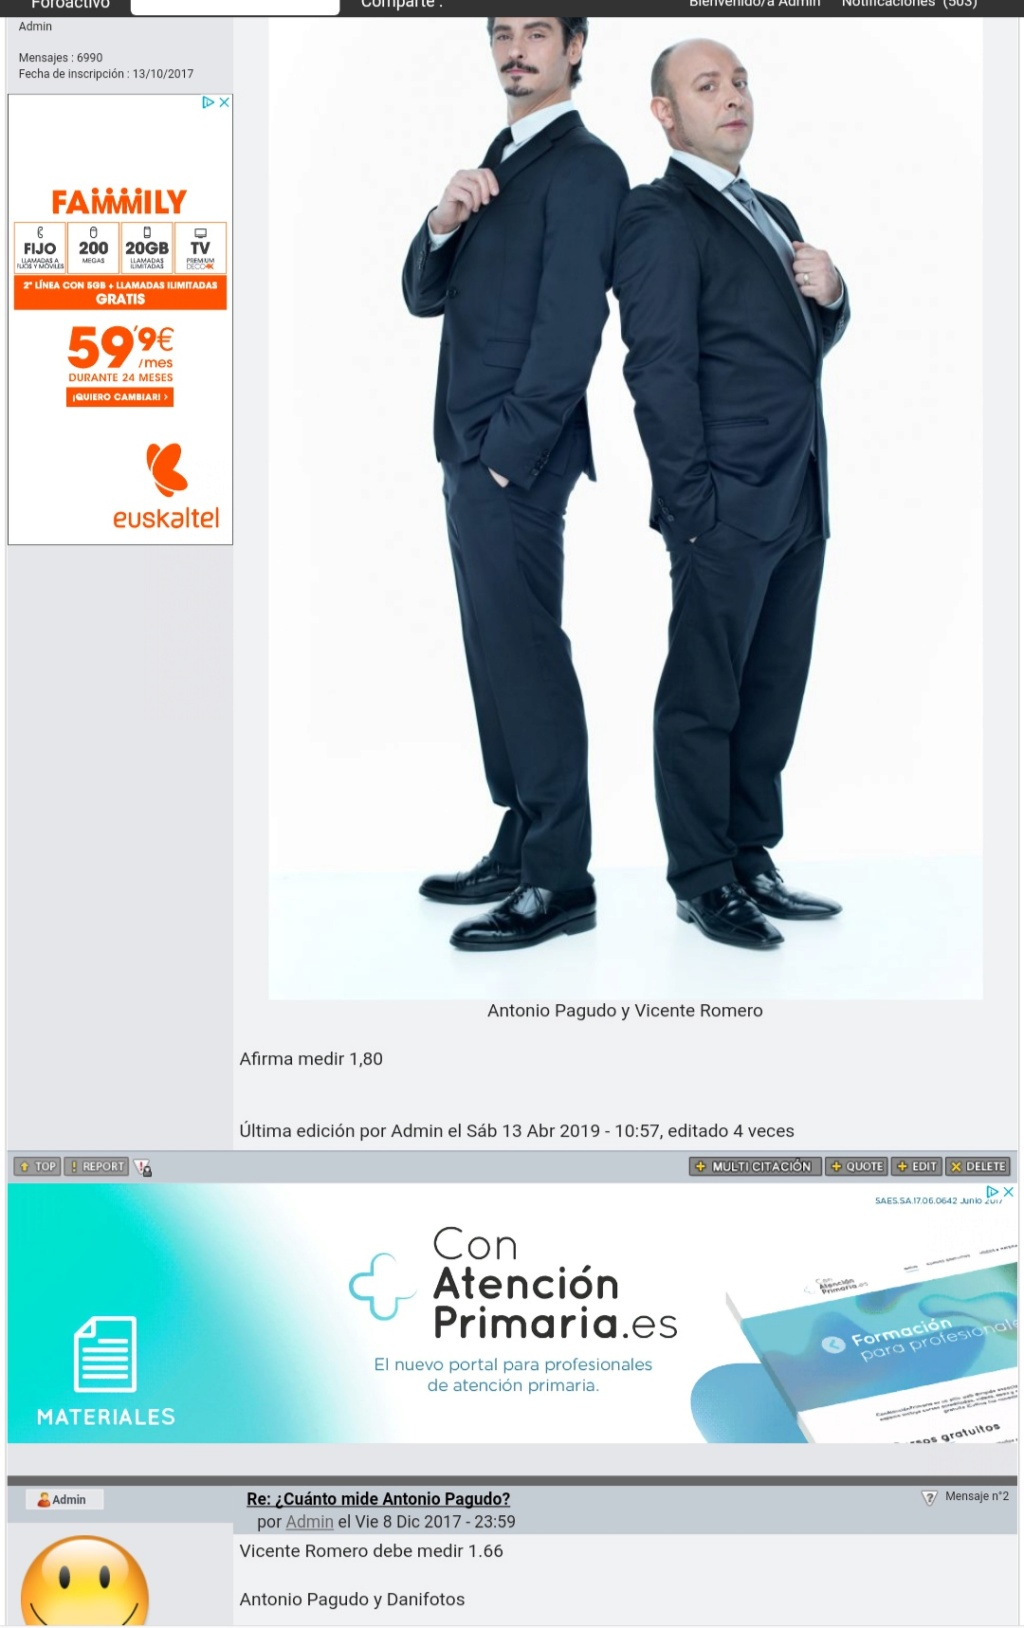 ¿Cuánto mide Vicente Romero? Img_2123